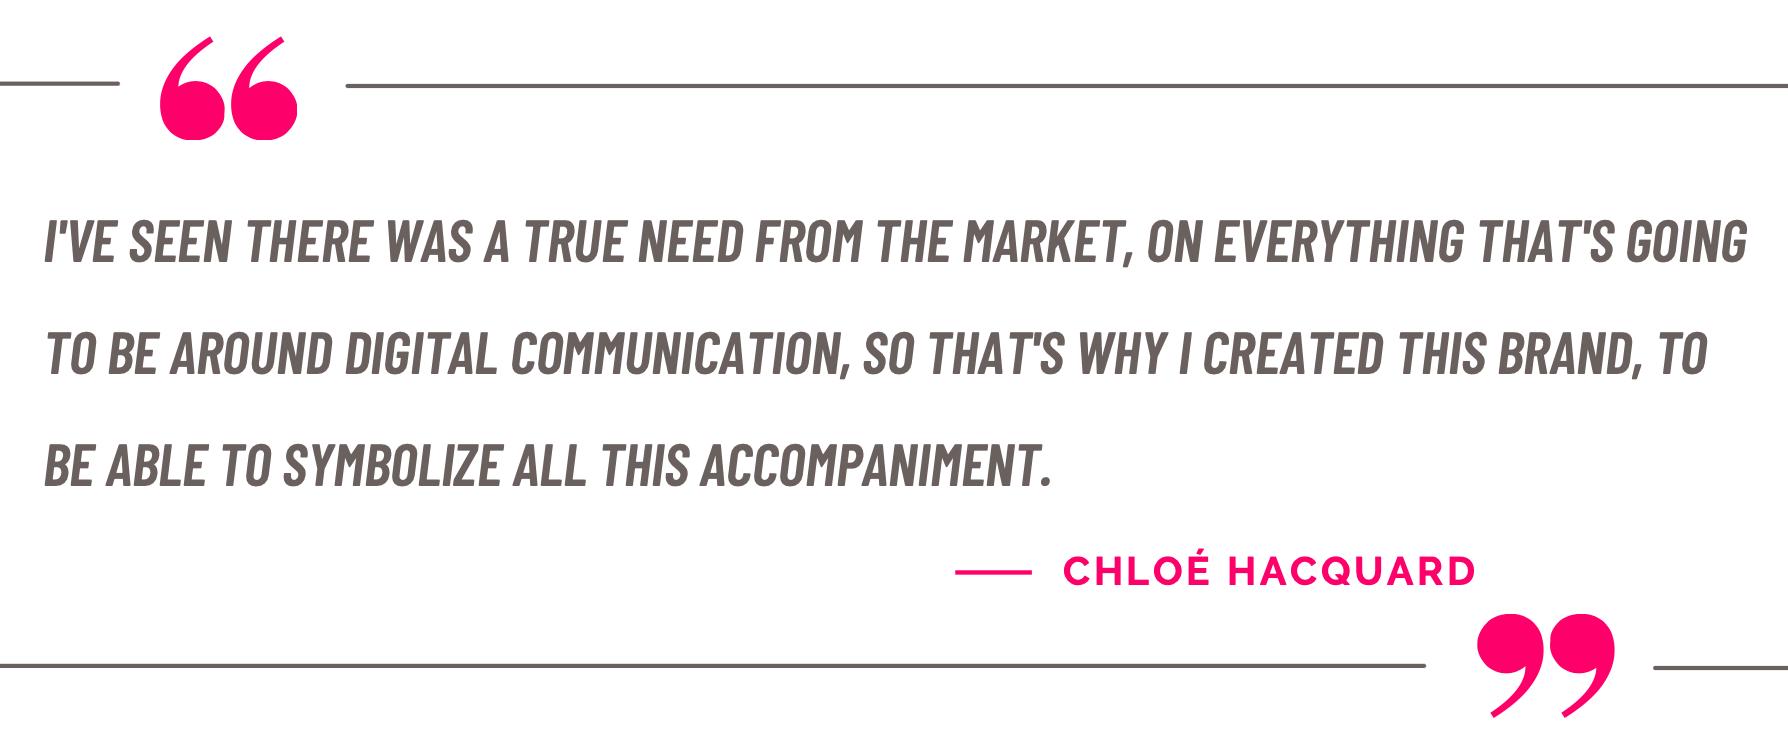 Chloe Hacquard quote